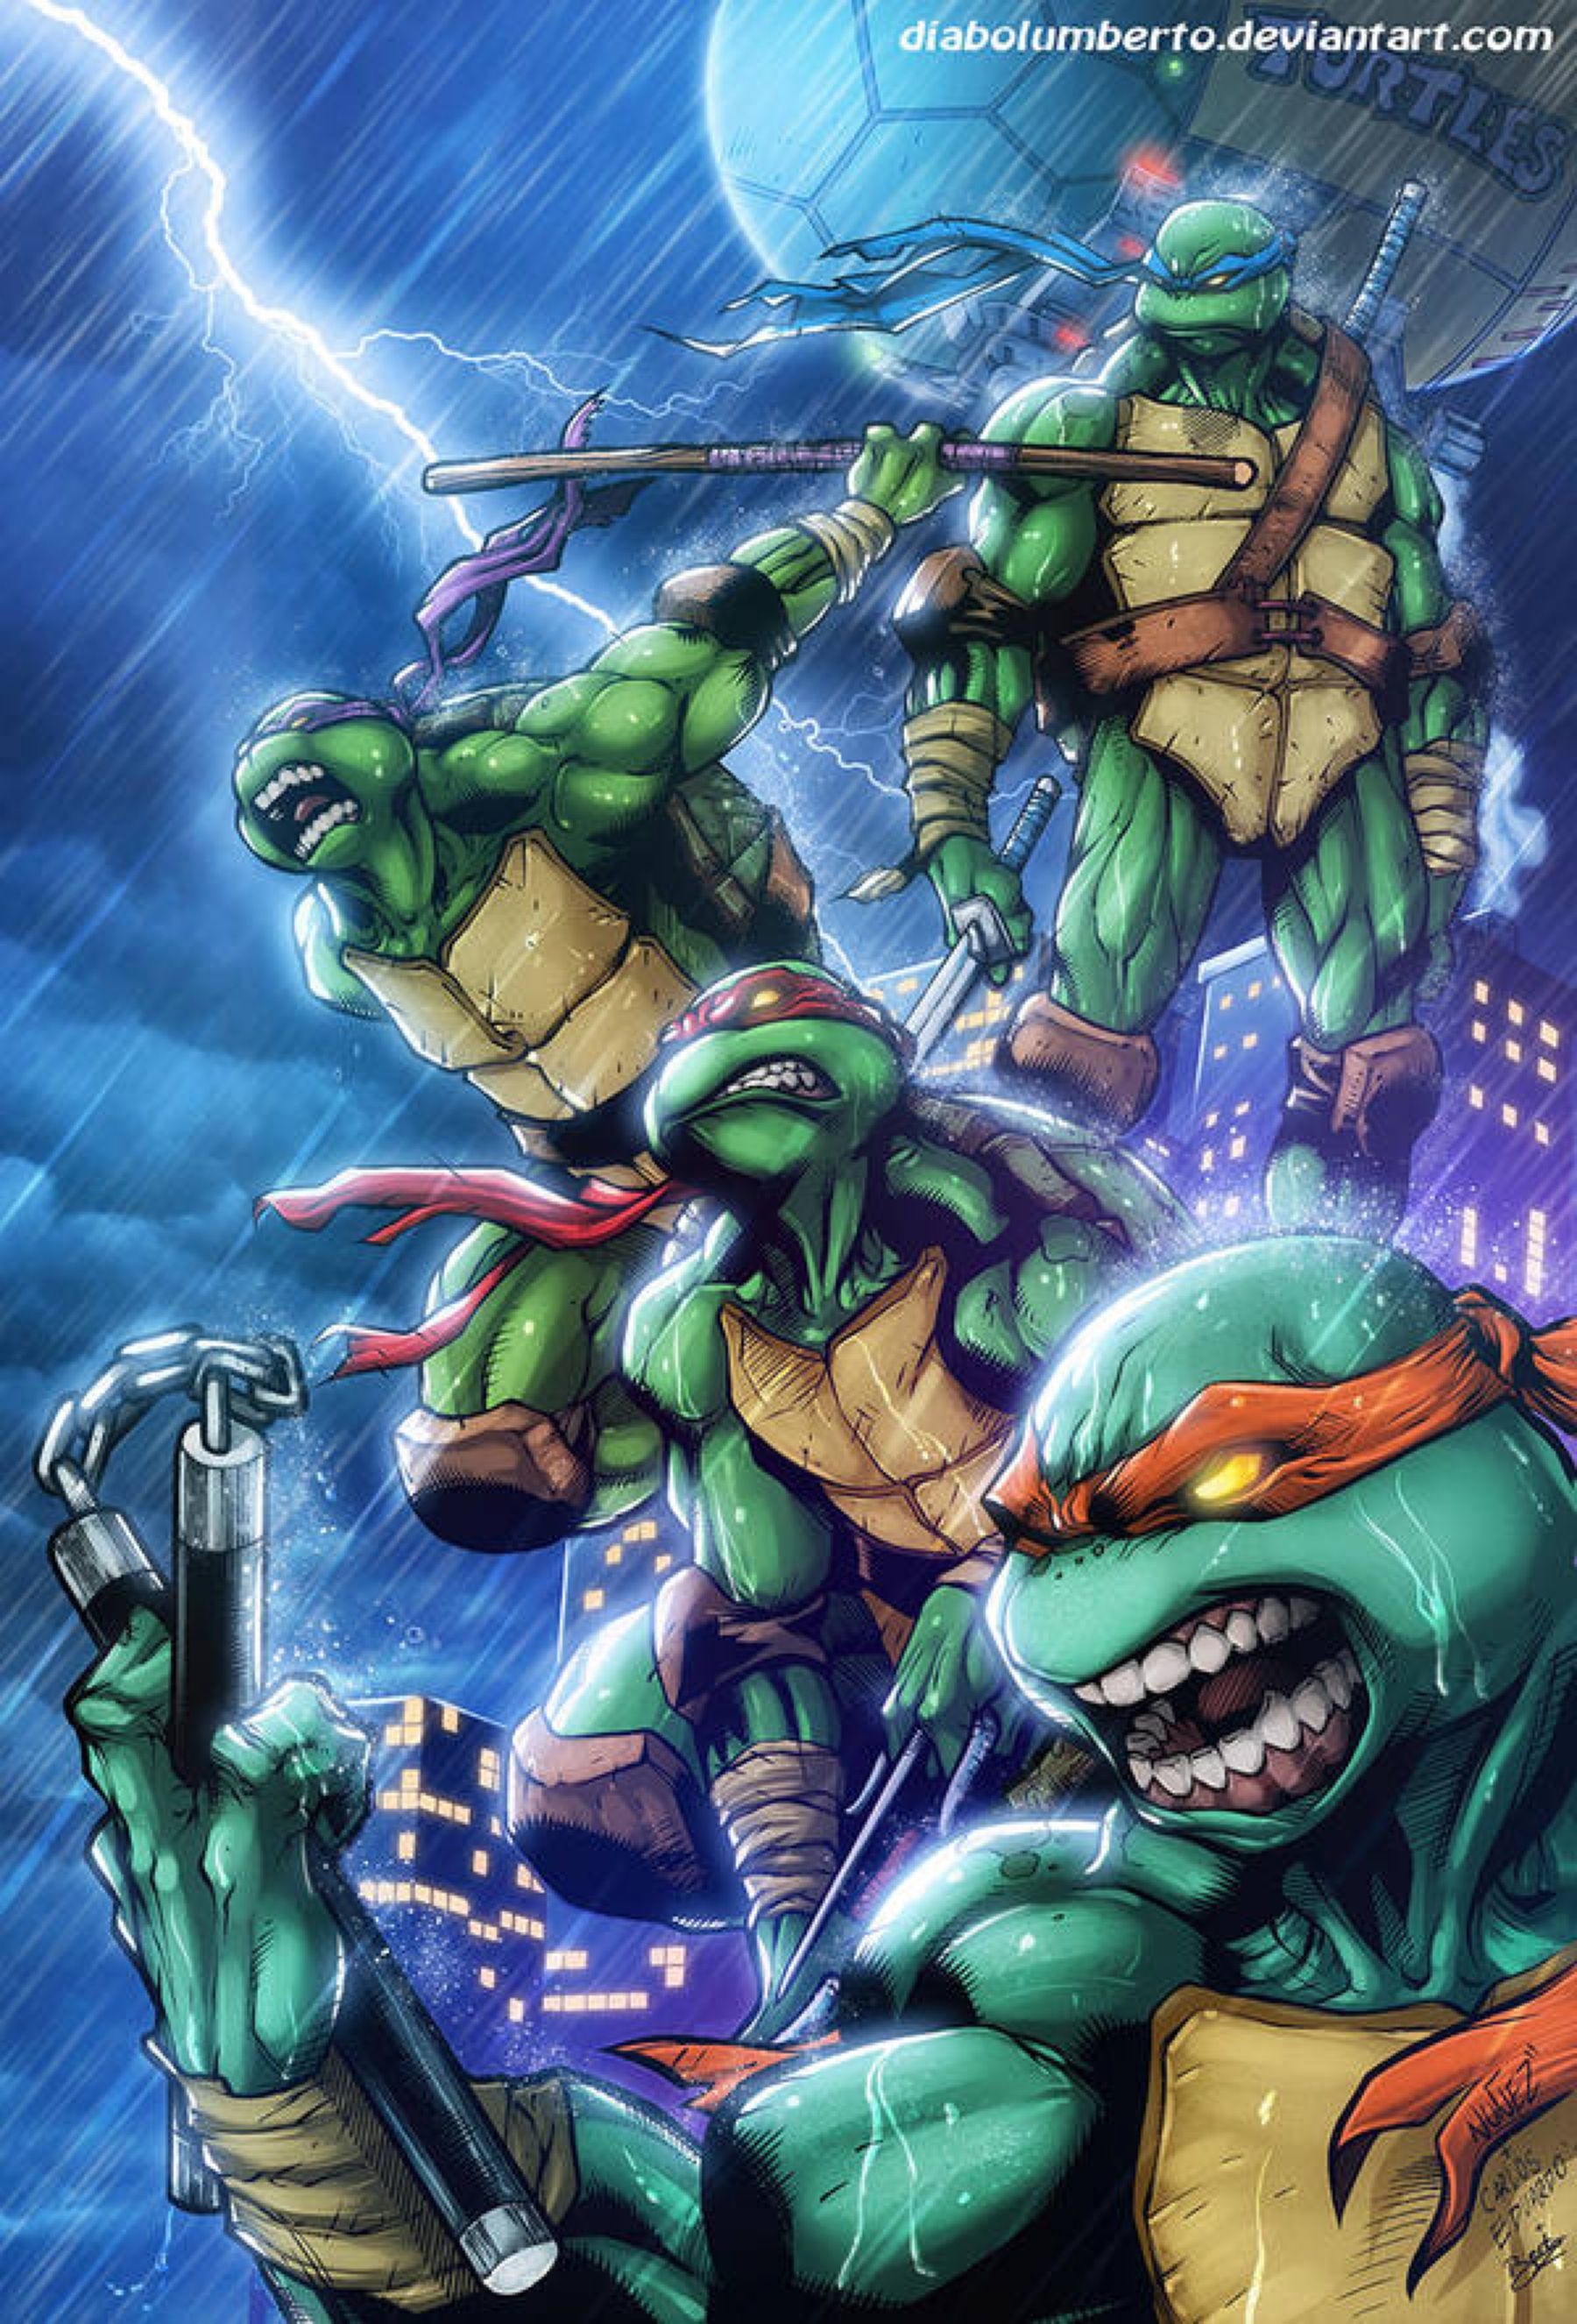 June 20 - Ninja Turtles by KileyBeecher on DeviantArt